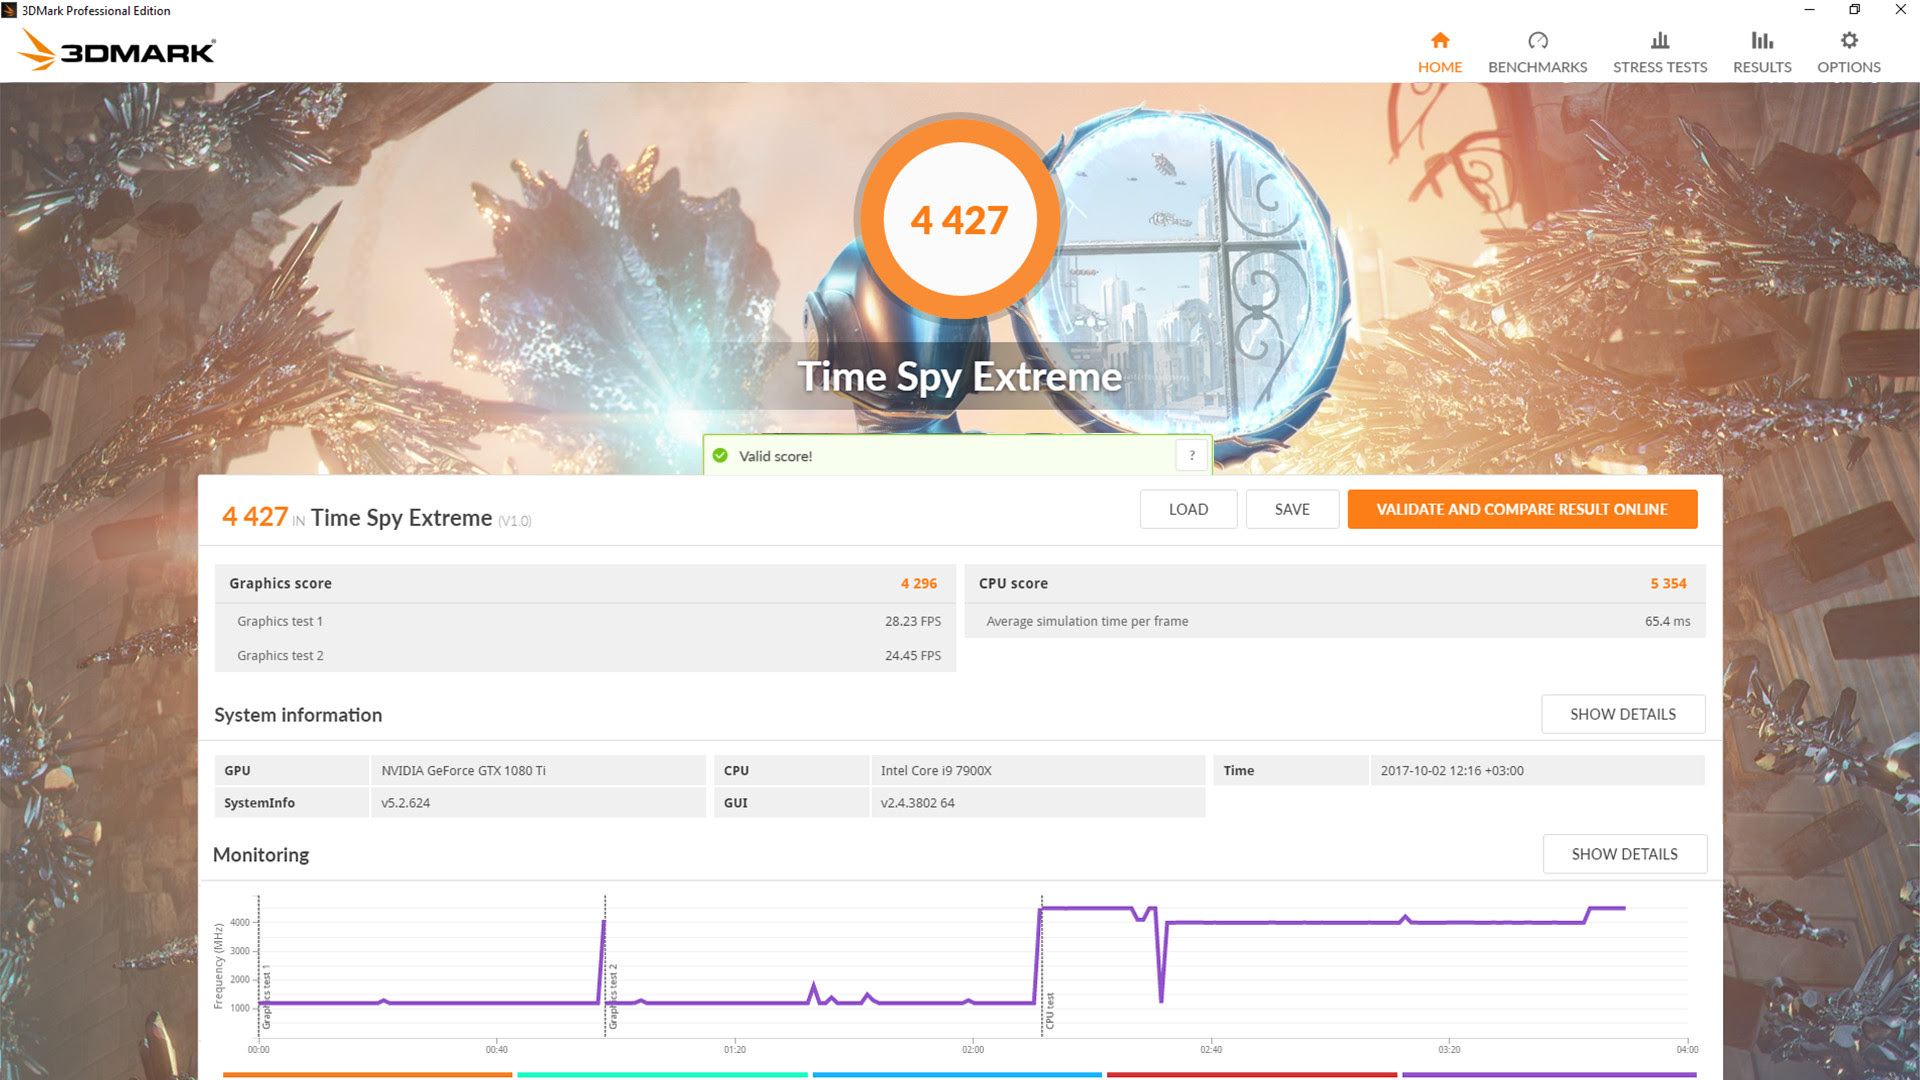 3DMark Time Spy Extreme result screenshot